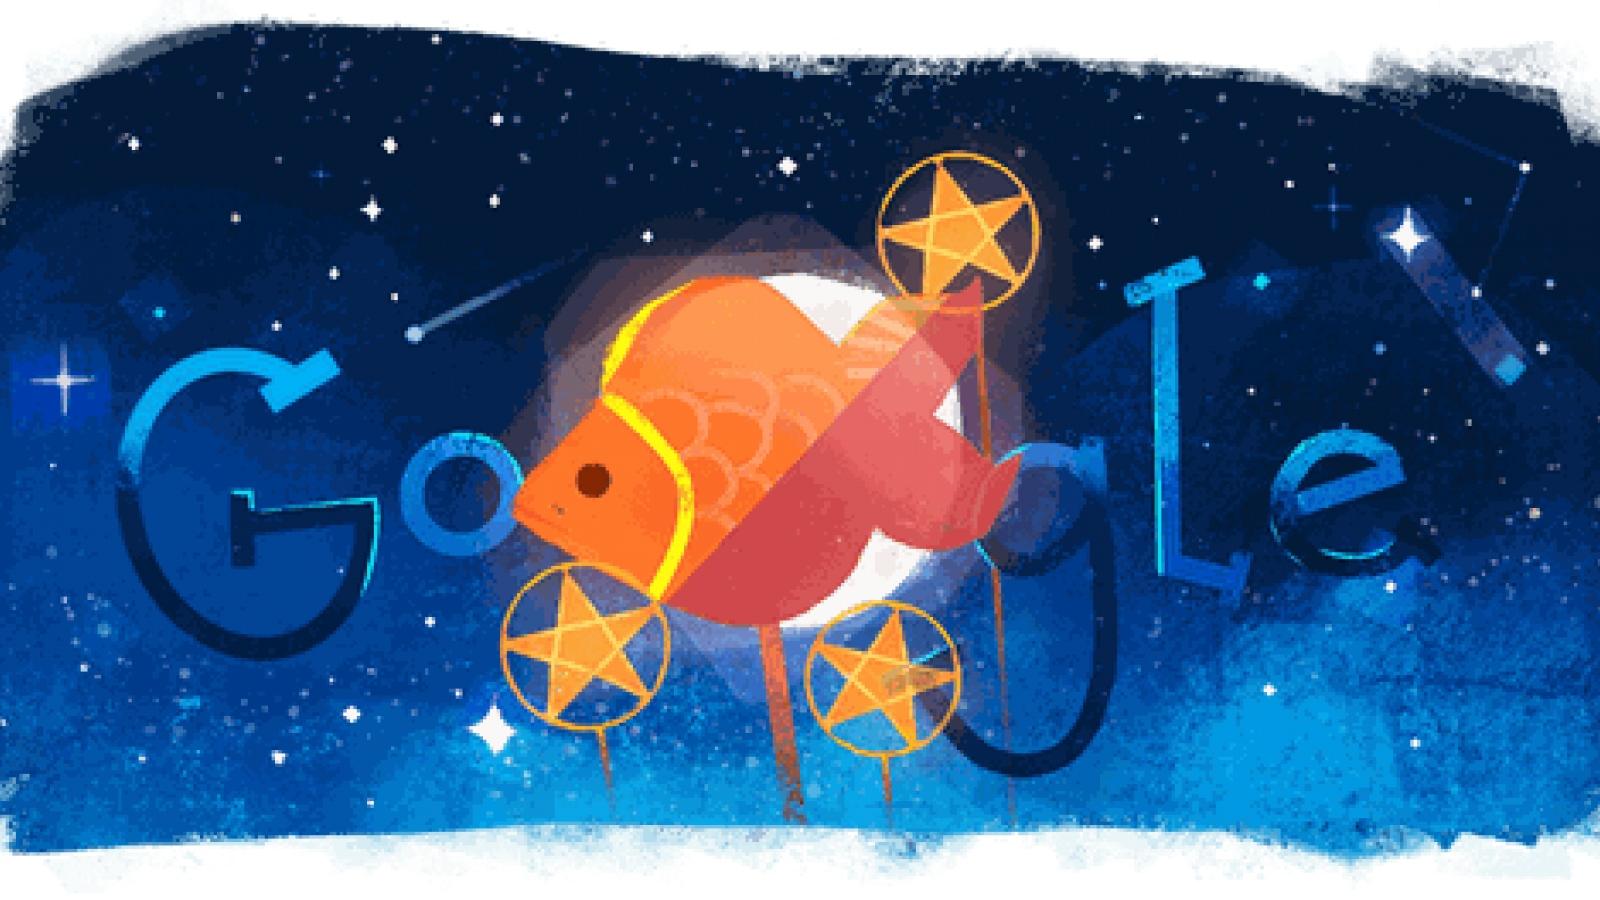 Google Doodle celebrates Vietnamese Mid-Autumn Festival